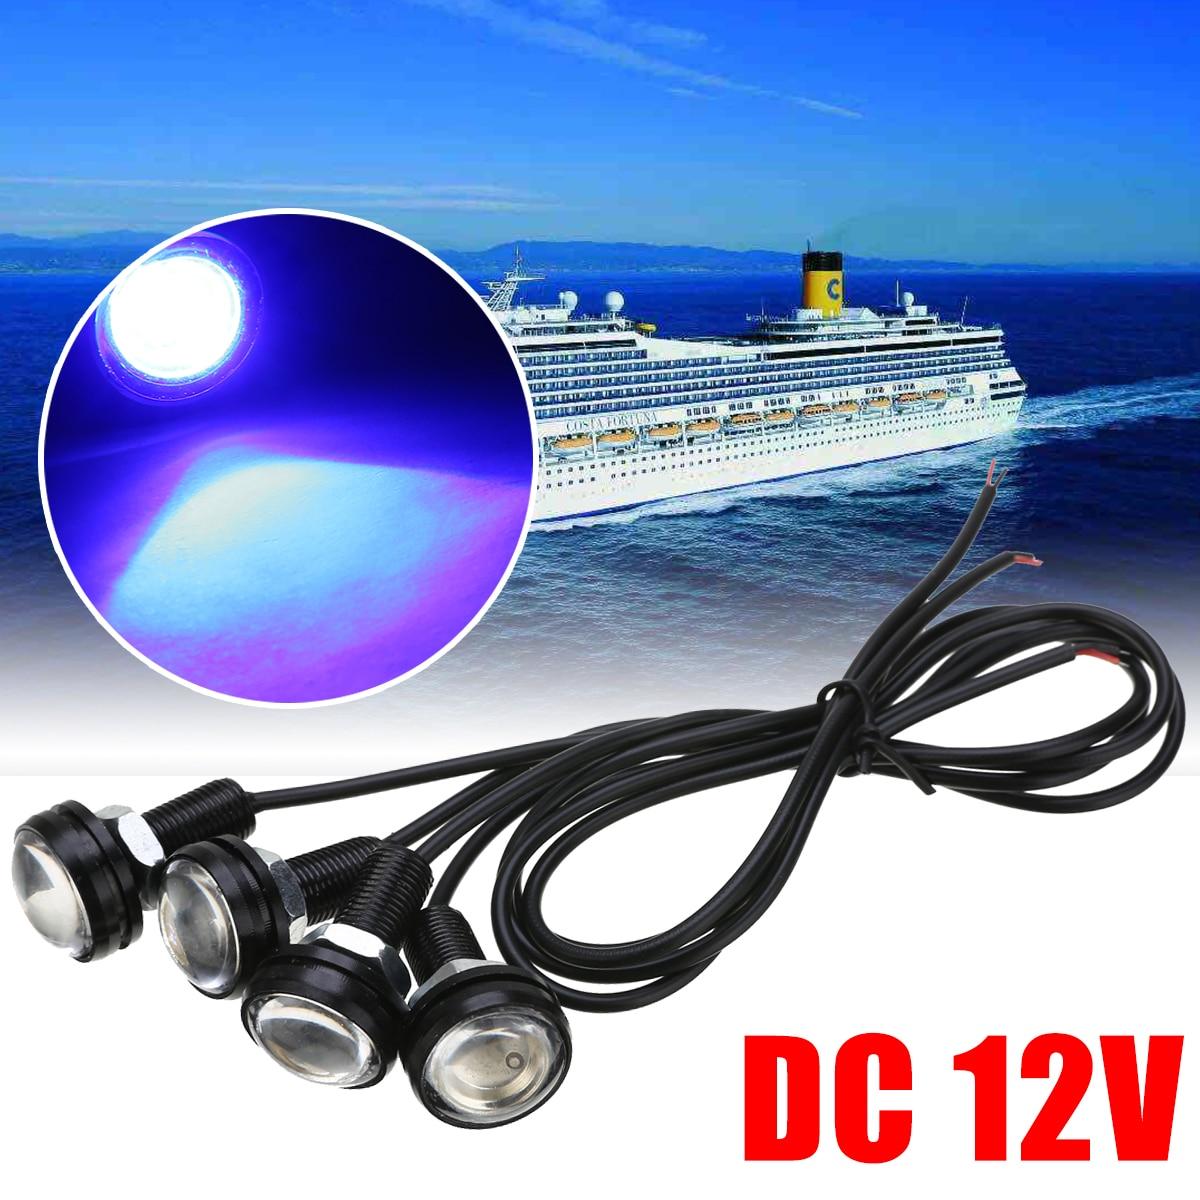 Universal 4Pcs/Set Blue LED Boat Plug Light Waterproof Garboard Drain Marine Underwater Fish Boat Light Parts Accessories